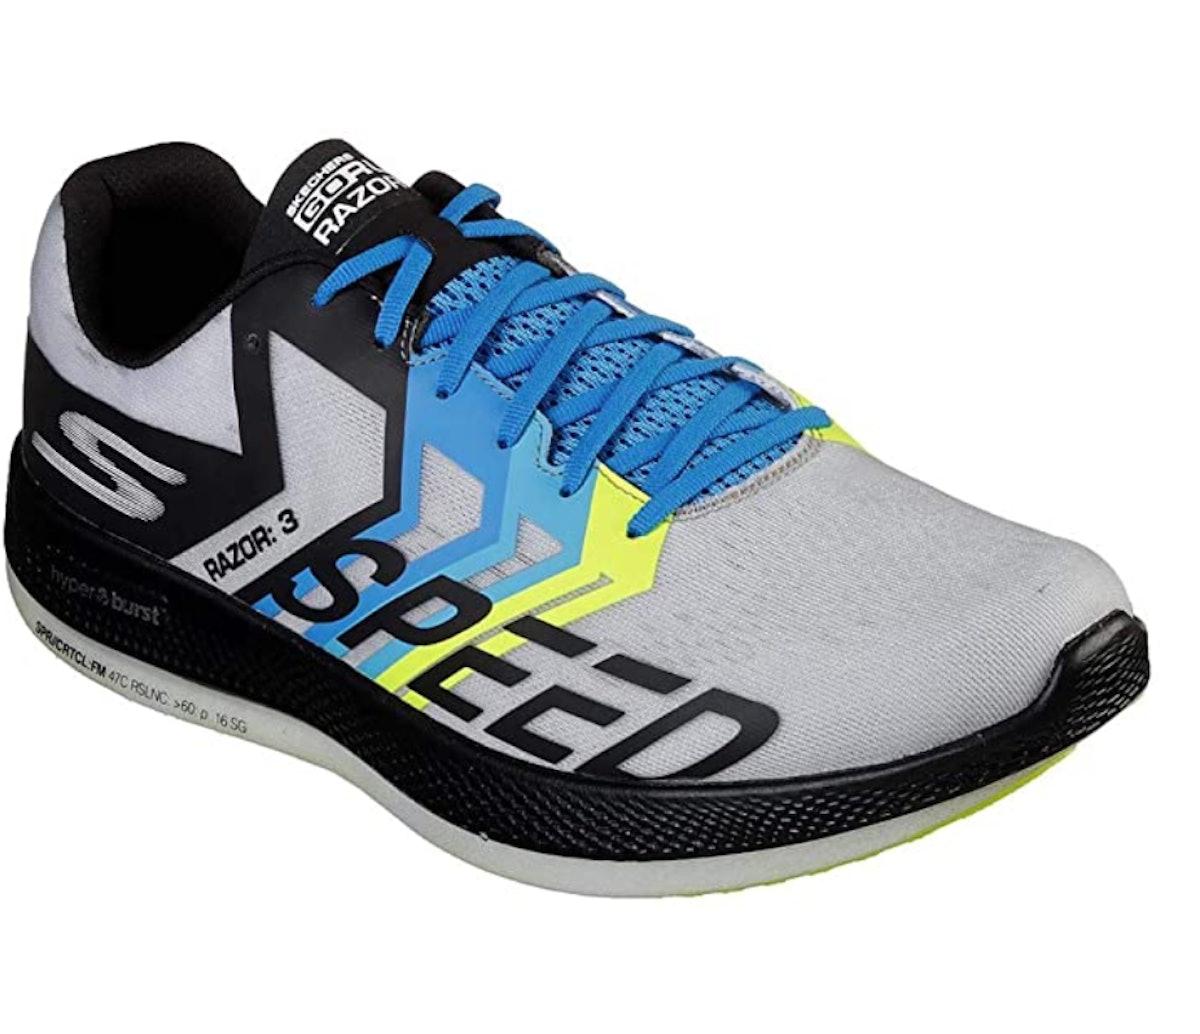 Skechers Unisex GOrun Razor 3 Hyper Running Shoe (6.4 Ounces)